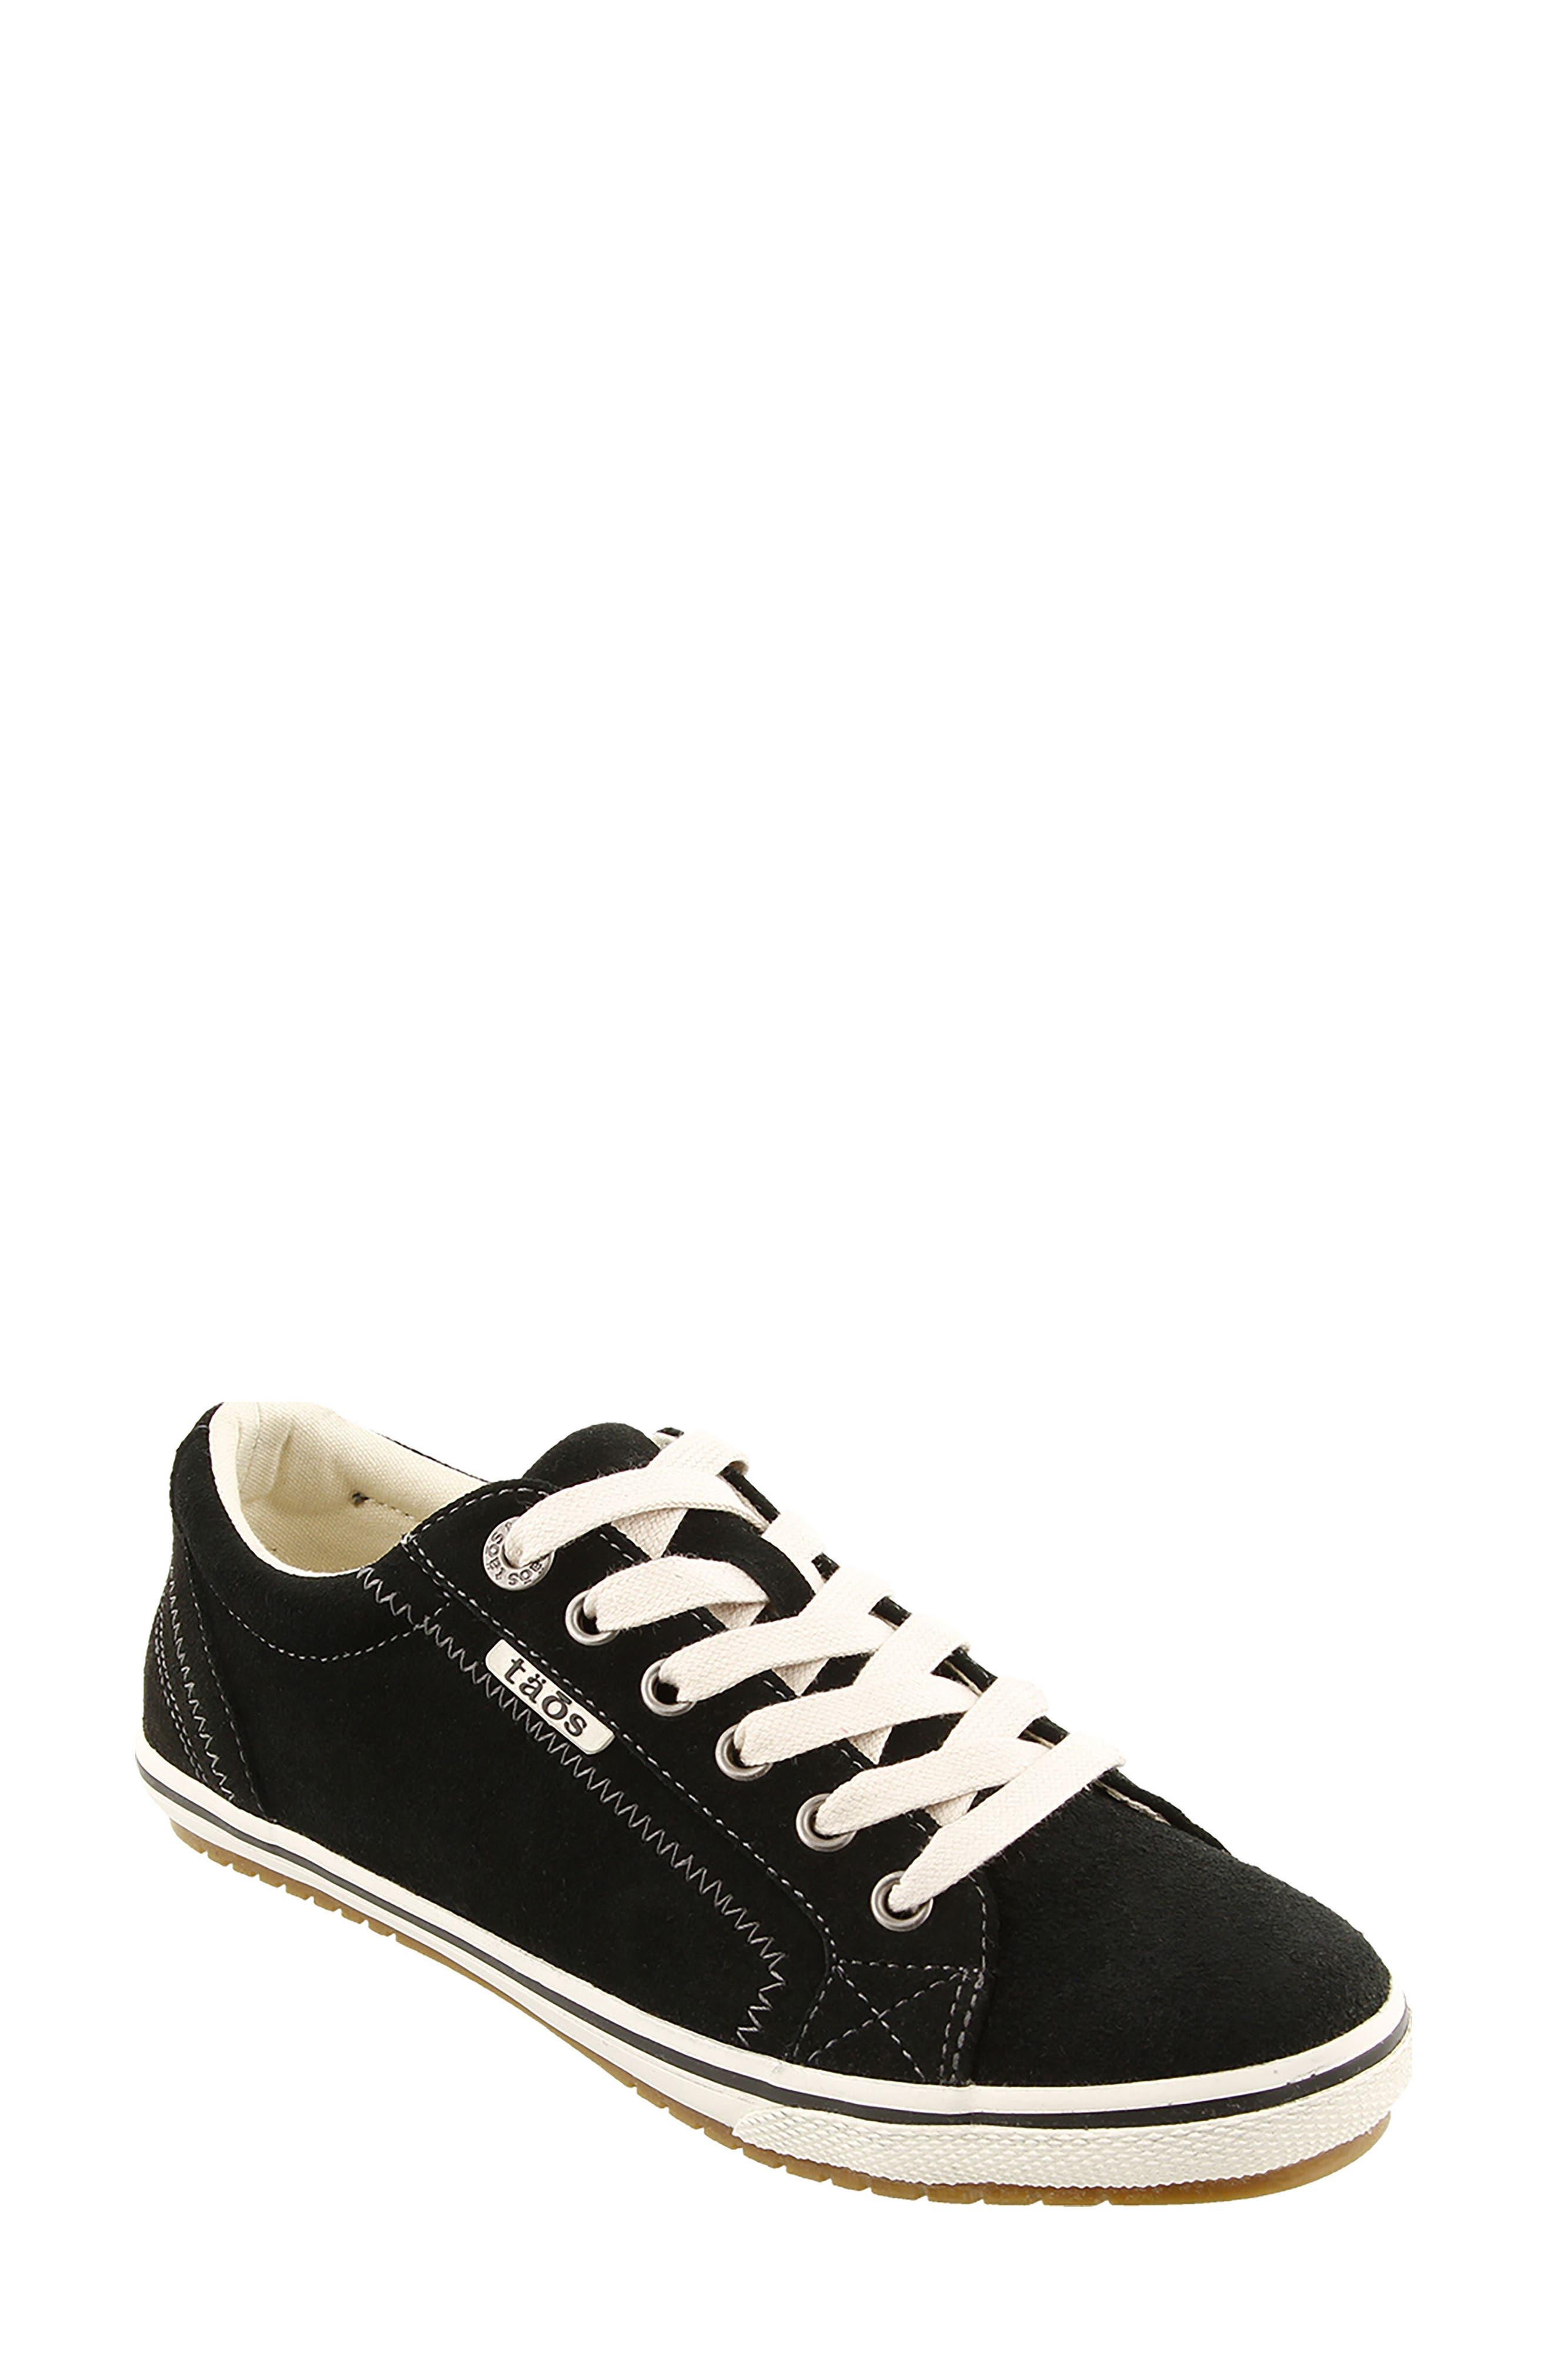 Main Image - Taos Retro Star Sneaker (Women)